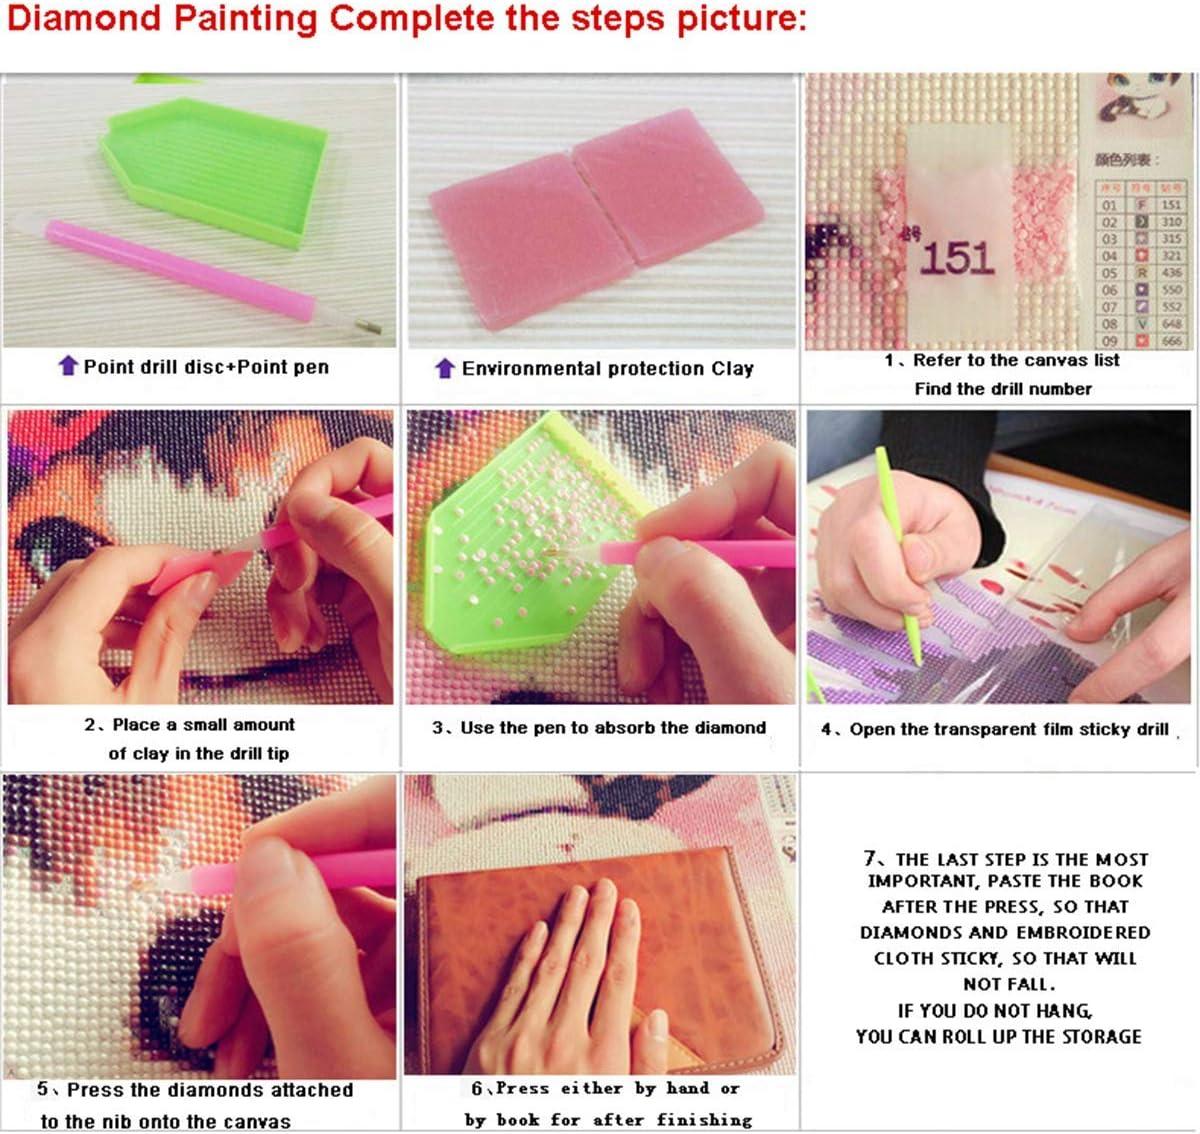 YAOYIN 5D Diamante Painting DIY Diamante Pittura Crystal Strass Ricamo Diamond Painting per Decorazione casa 45 35 cm//17,7 13,7 Pollici